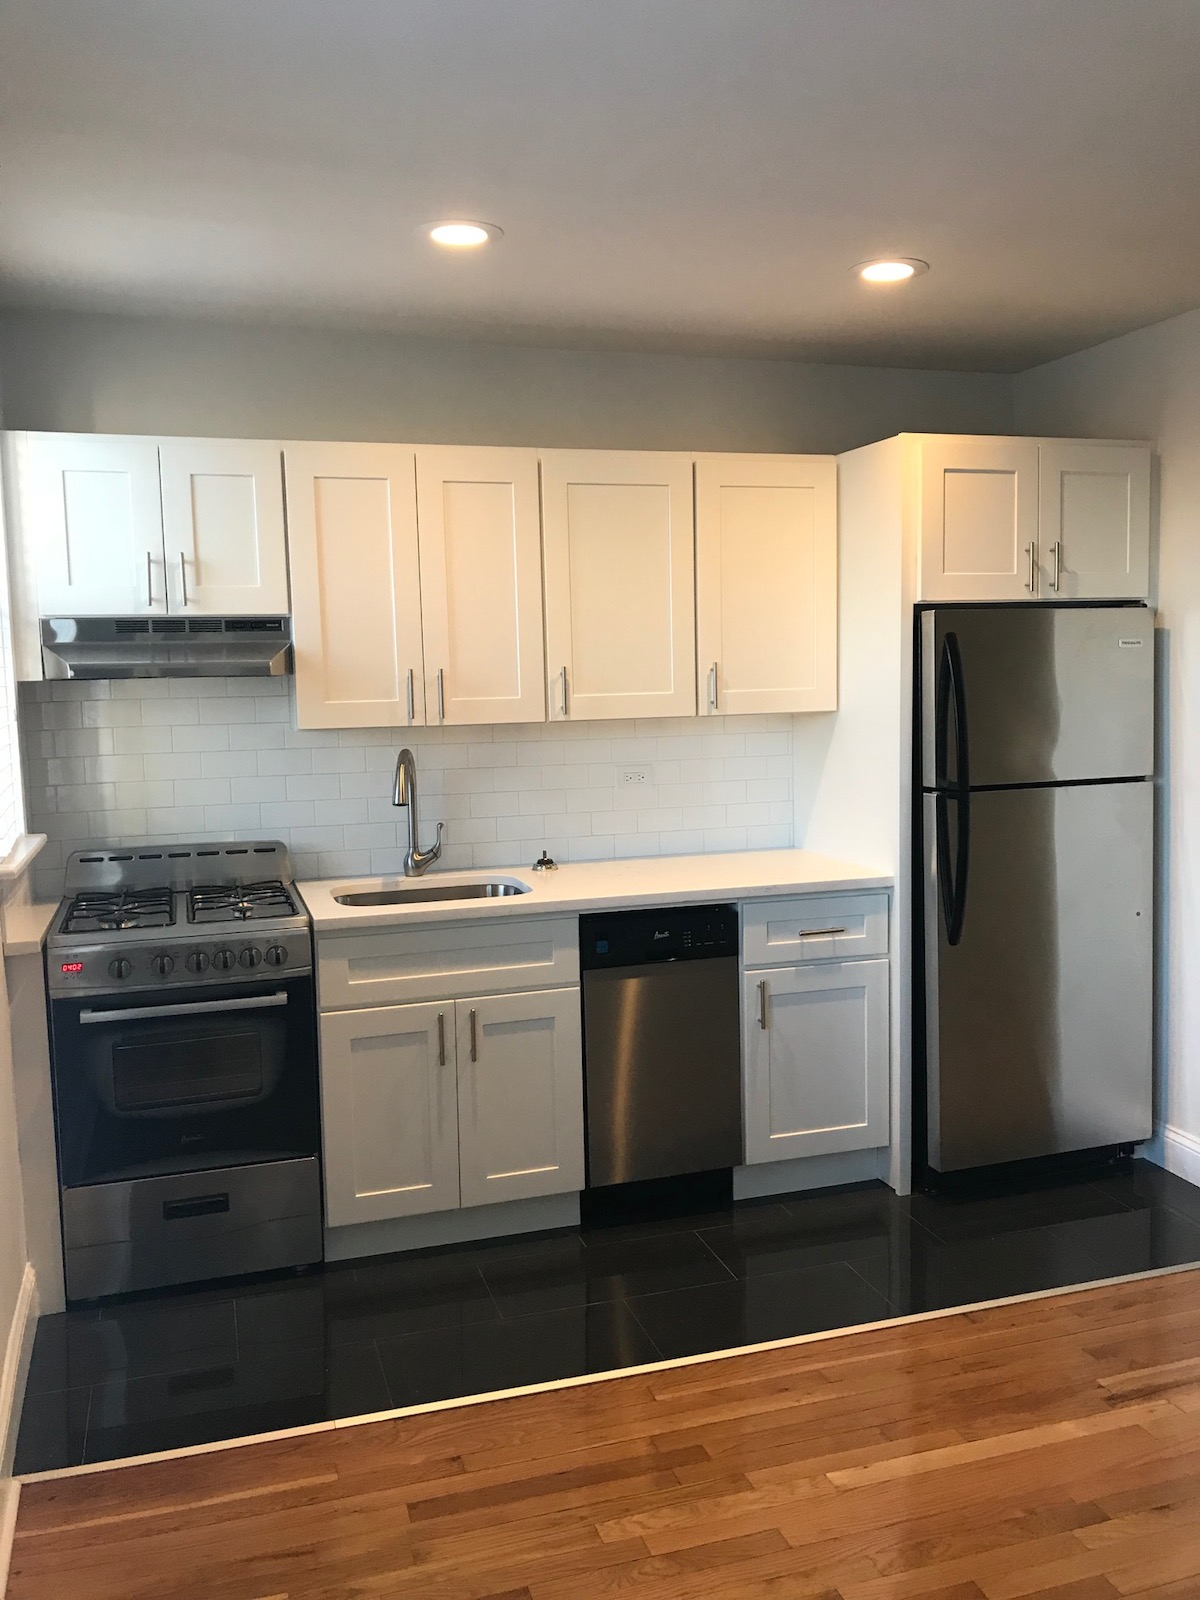 Realty Depot Ny Real Estate Amp Homes For Sale Ny Real